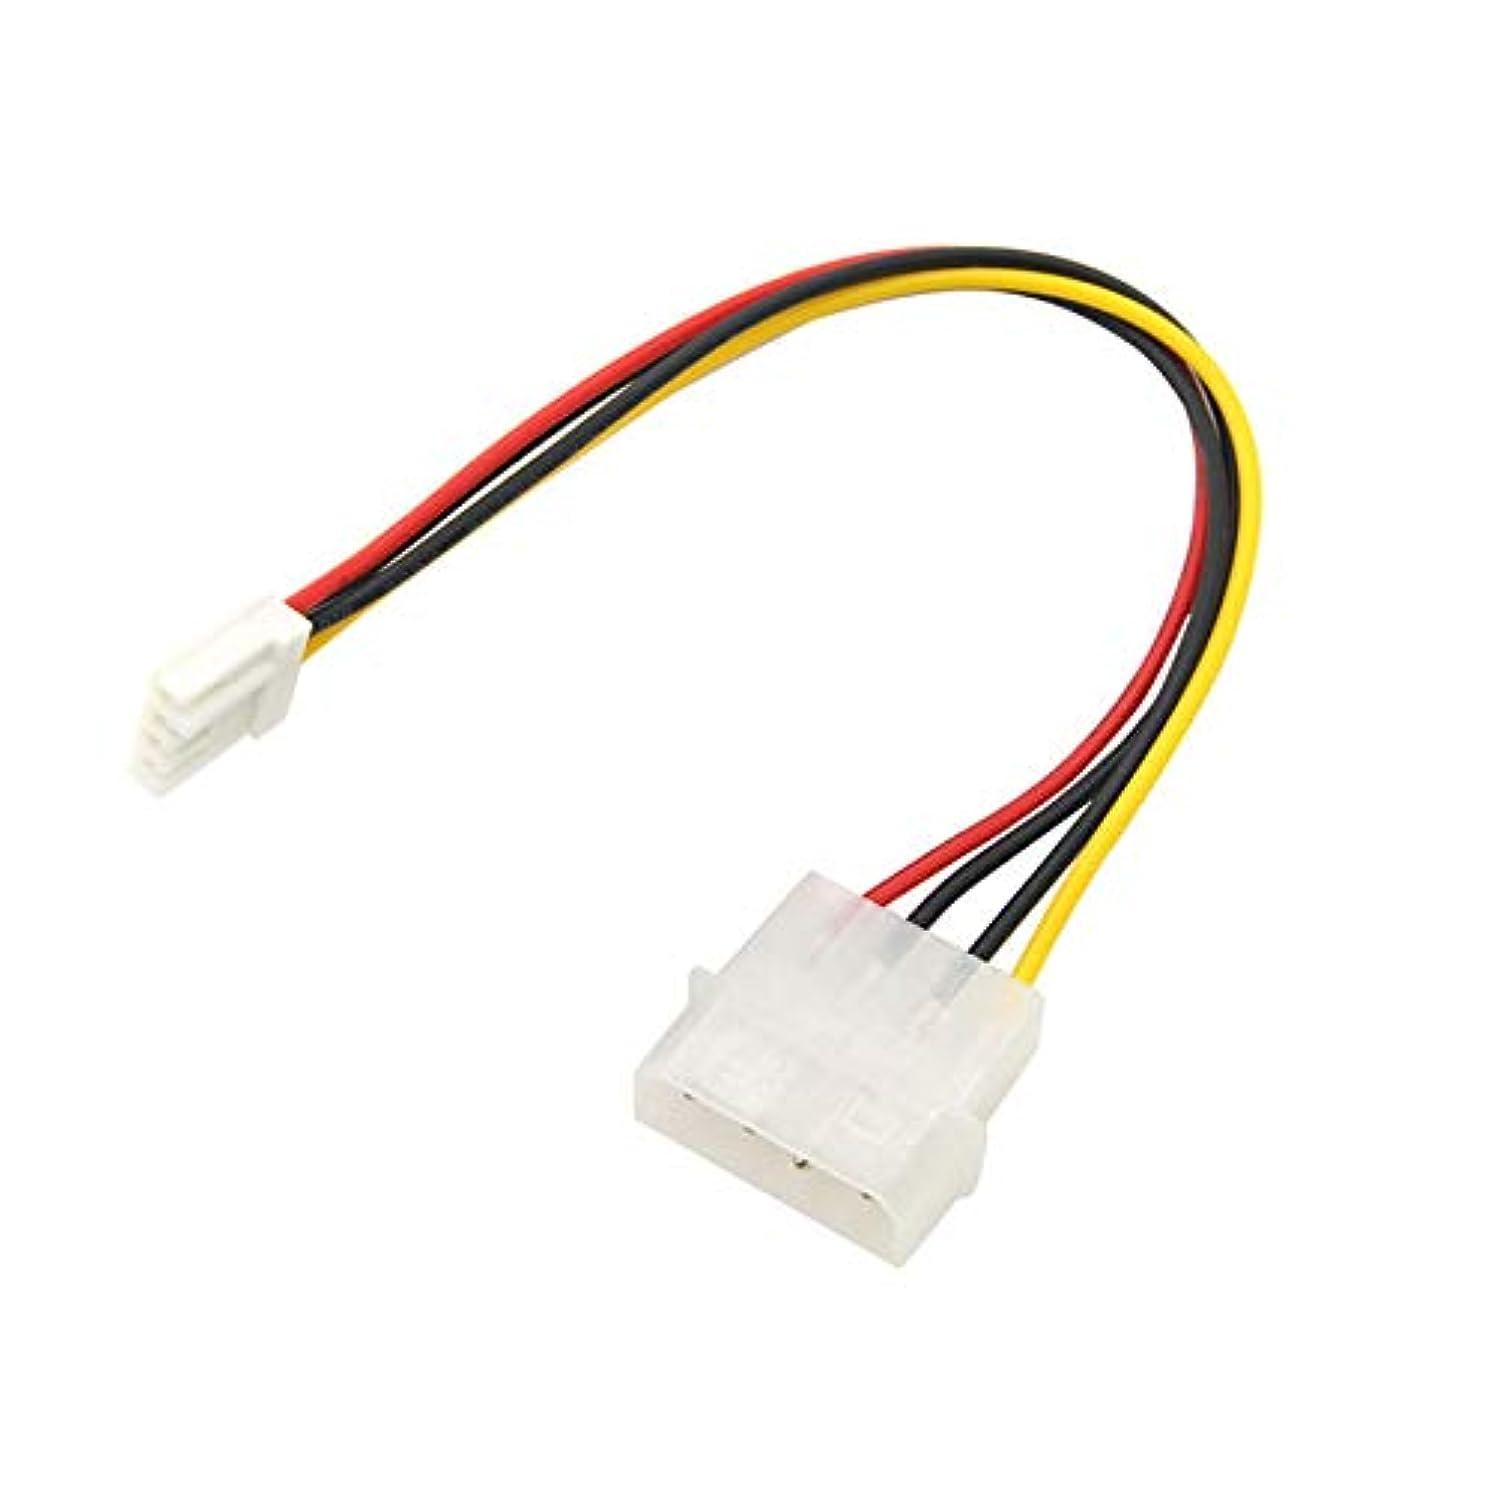 Diskette Power Adaptor,YRD TECH 4 Pin Molex to 3.5